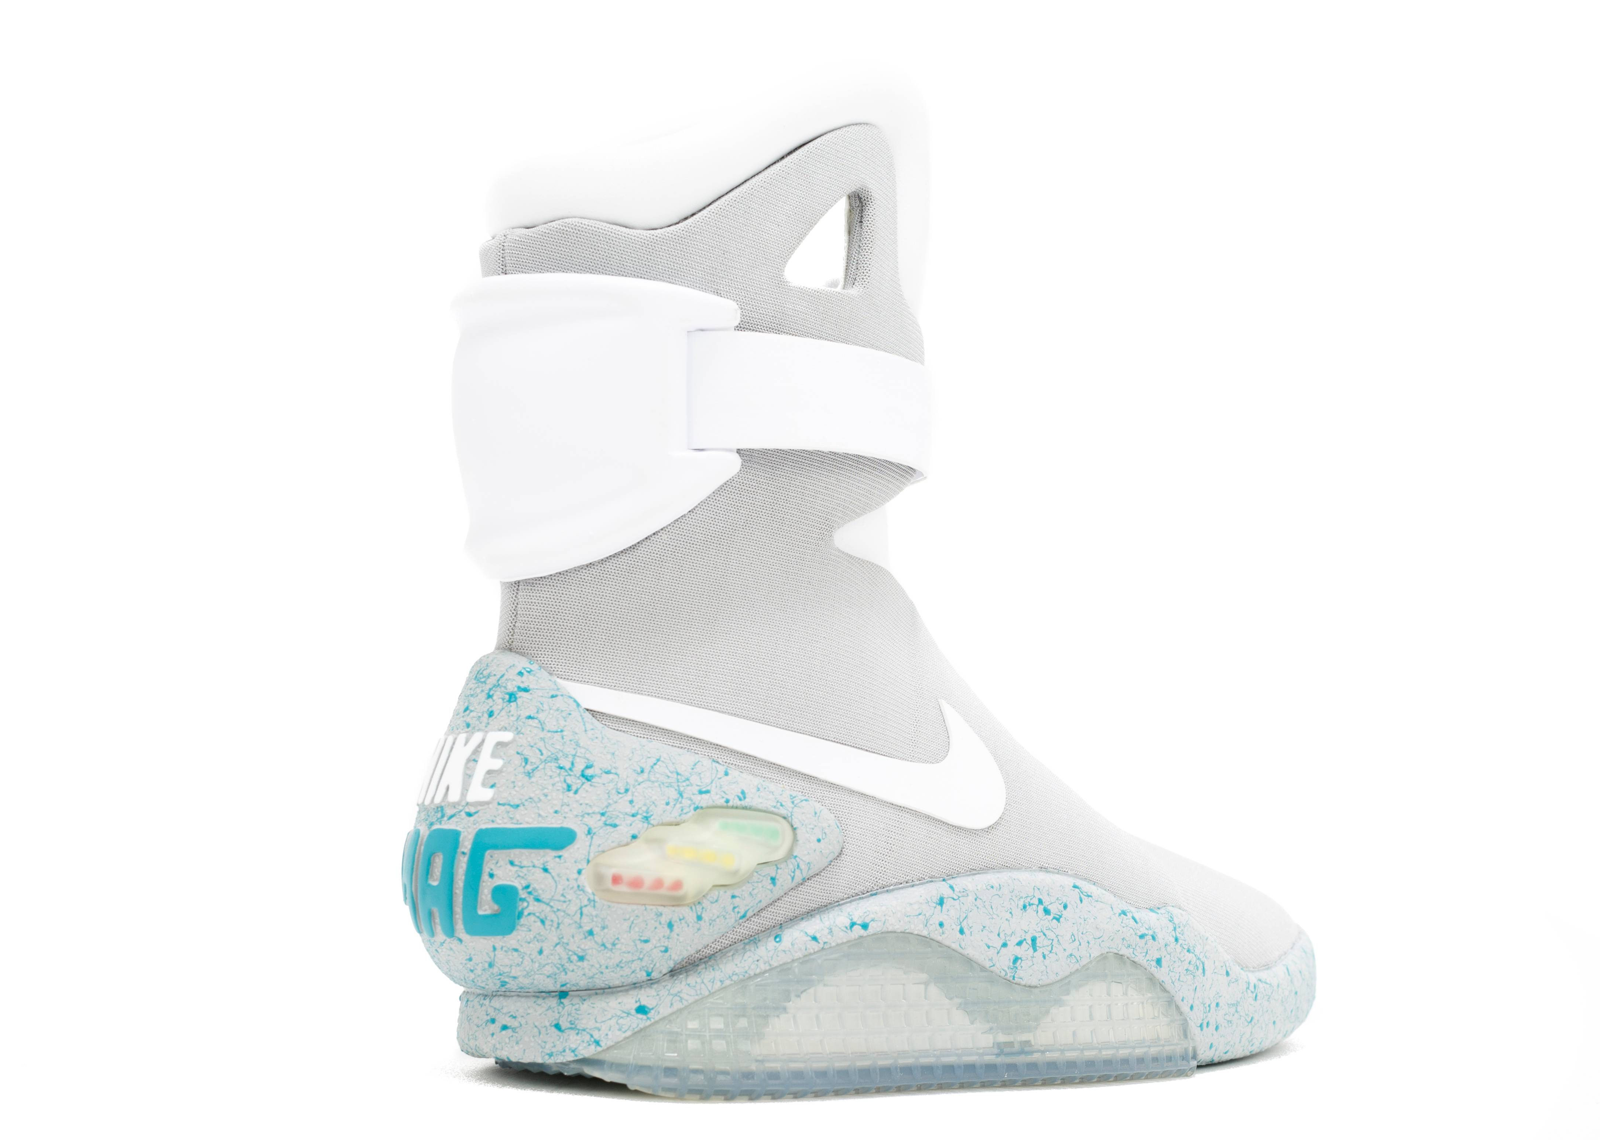 Imitation Disobedience Penetrate  Nike Mag 'Back To The Future' - Nike - 417744 001 - jetstream/white-pl blue  | Flight Club